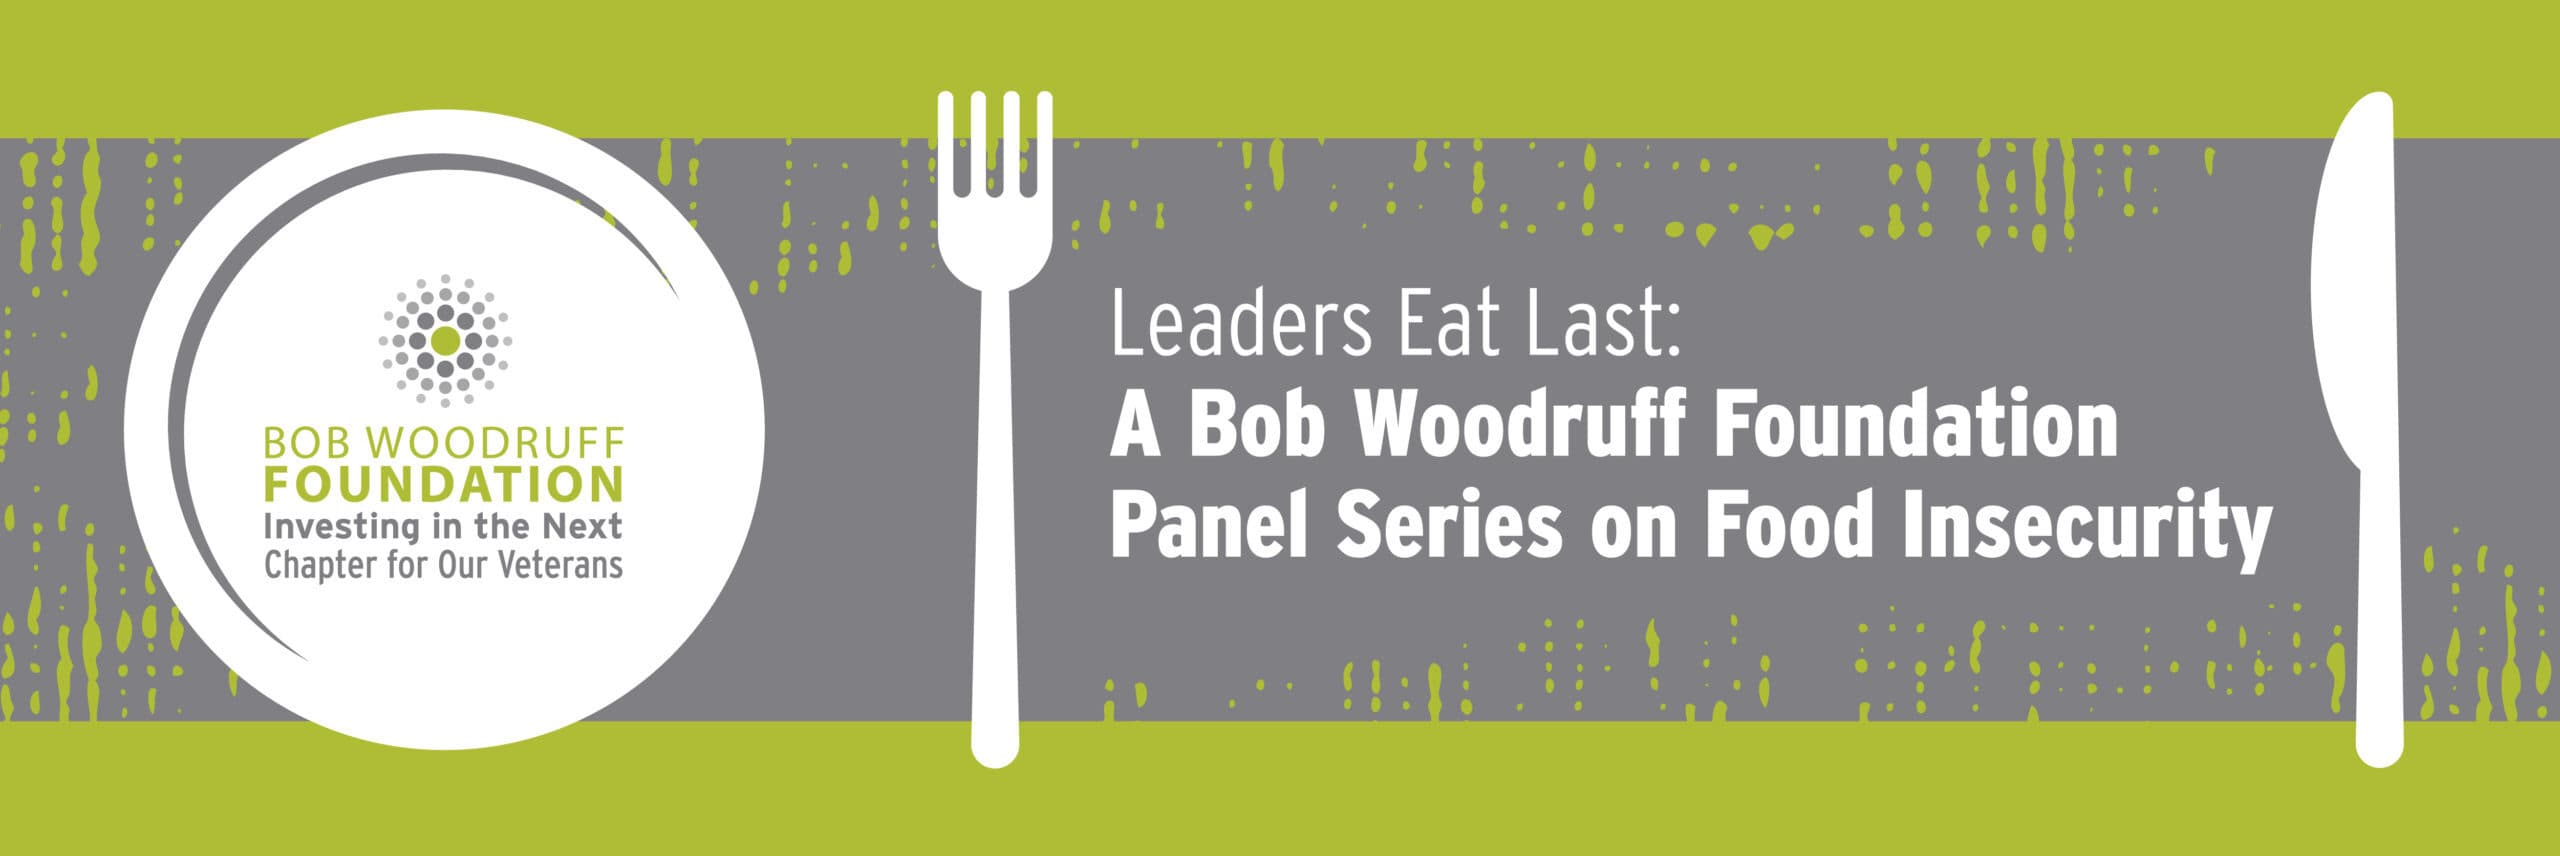 BWF Leaders Eat Last